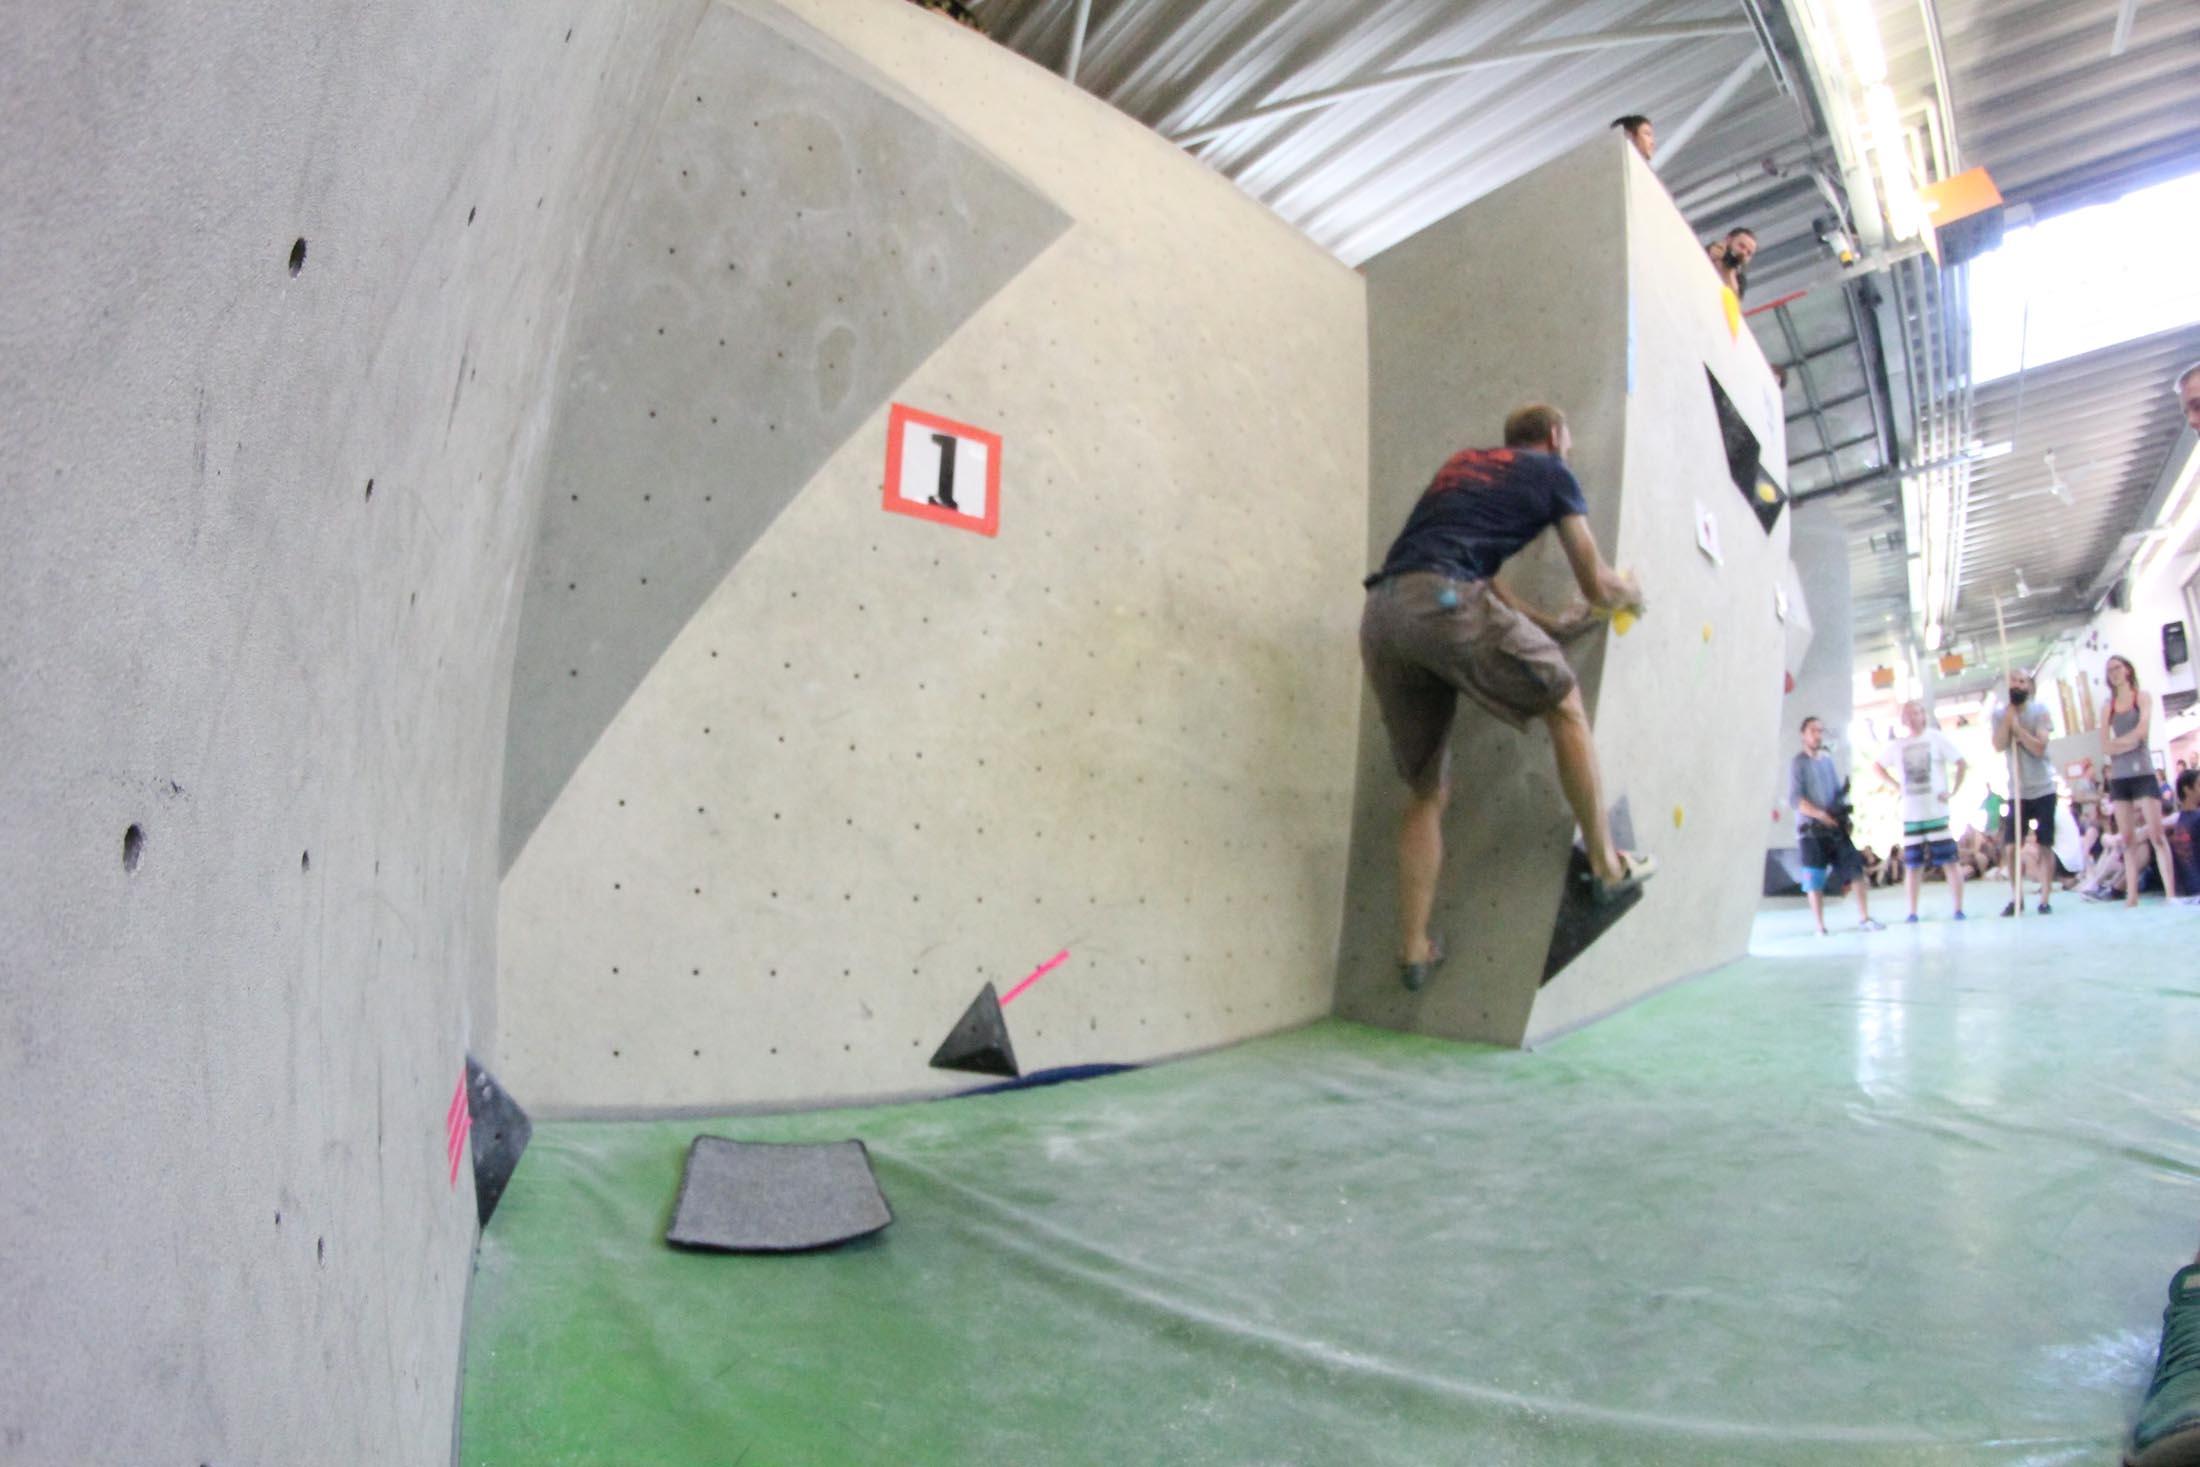 Finale, internationaler bouldercup Frankenjura 2016, BLOCKHELDEN Erlangen, Mammut, Bergfreunde.de, Boulderwettkampf07092016540